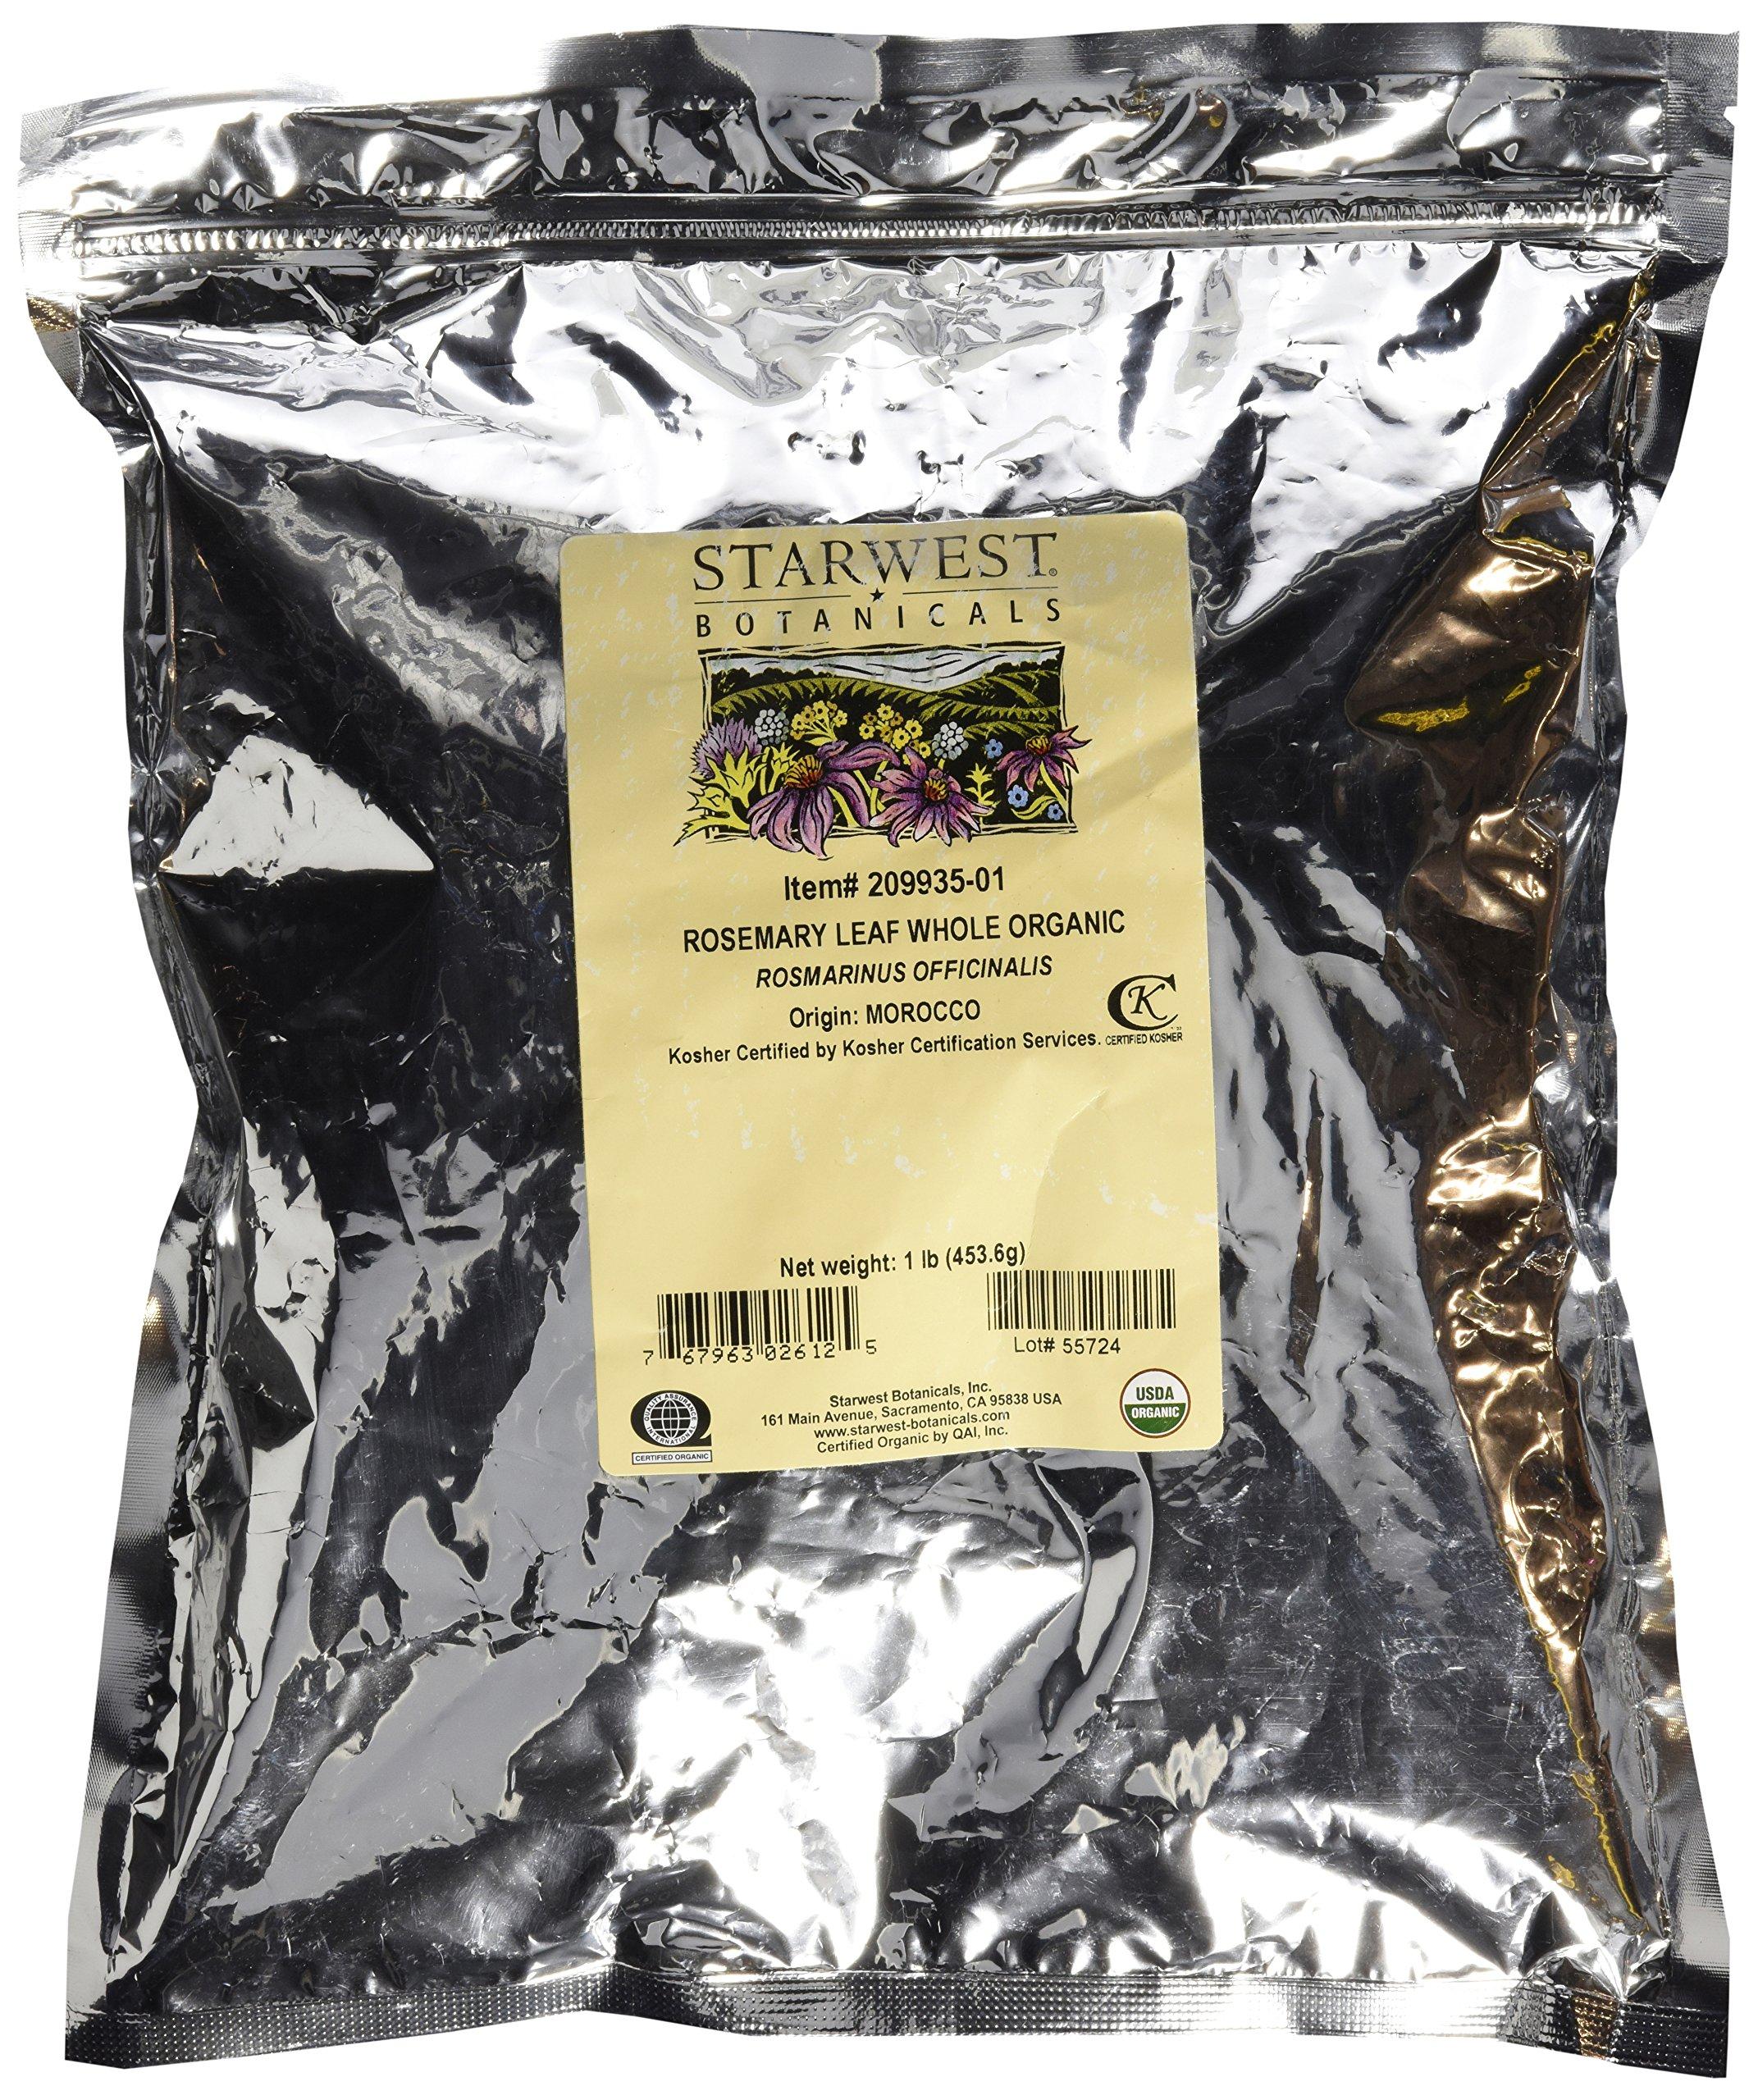 Starwest Botanicals Organic Rosemary Leaf Whole, 16 Oz. Bag (Pack of 6)